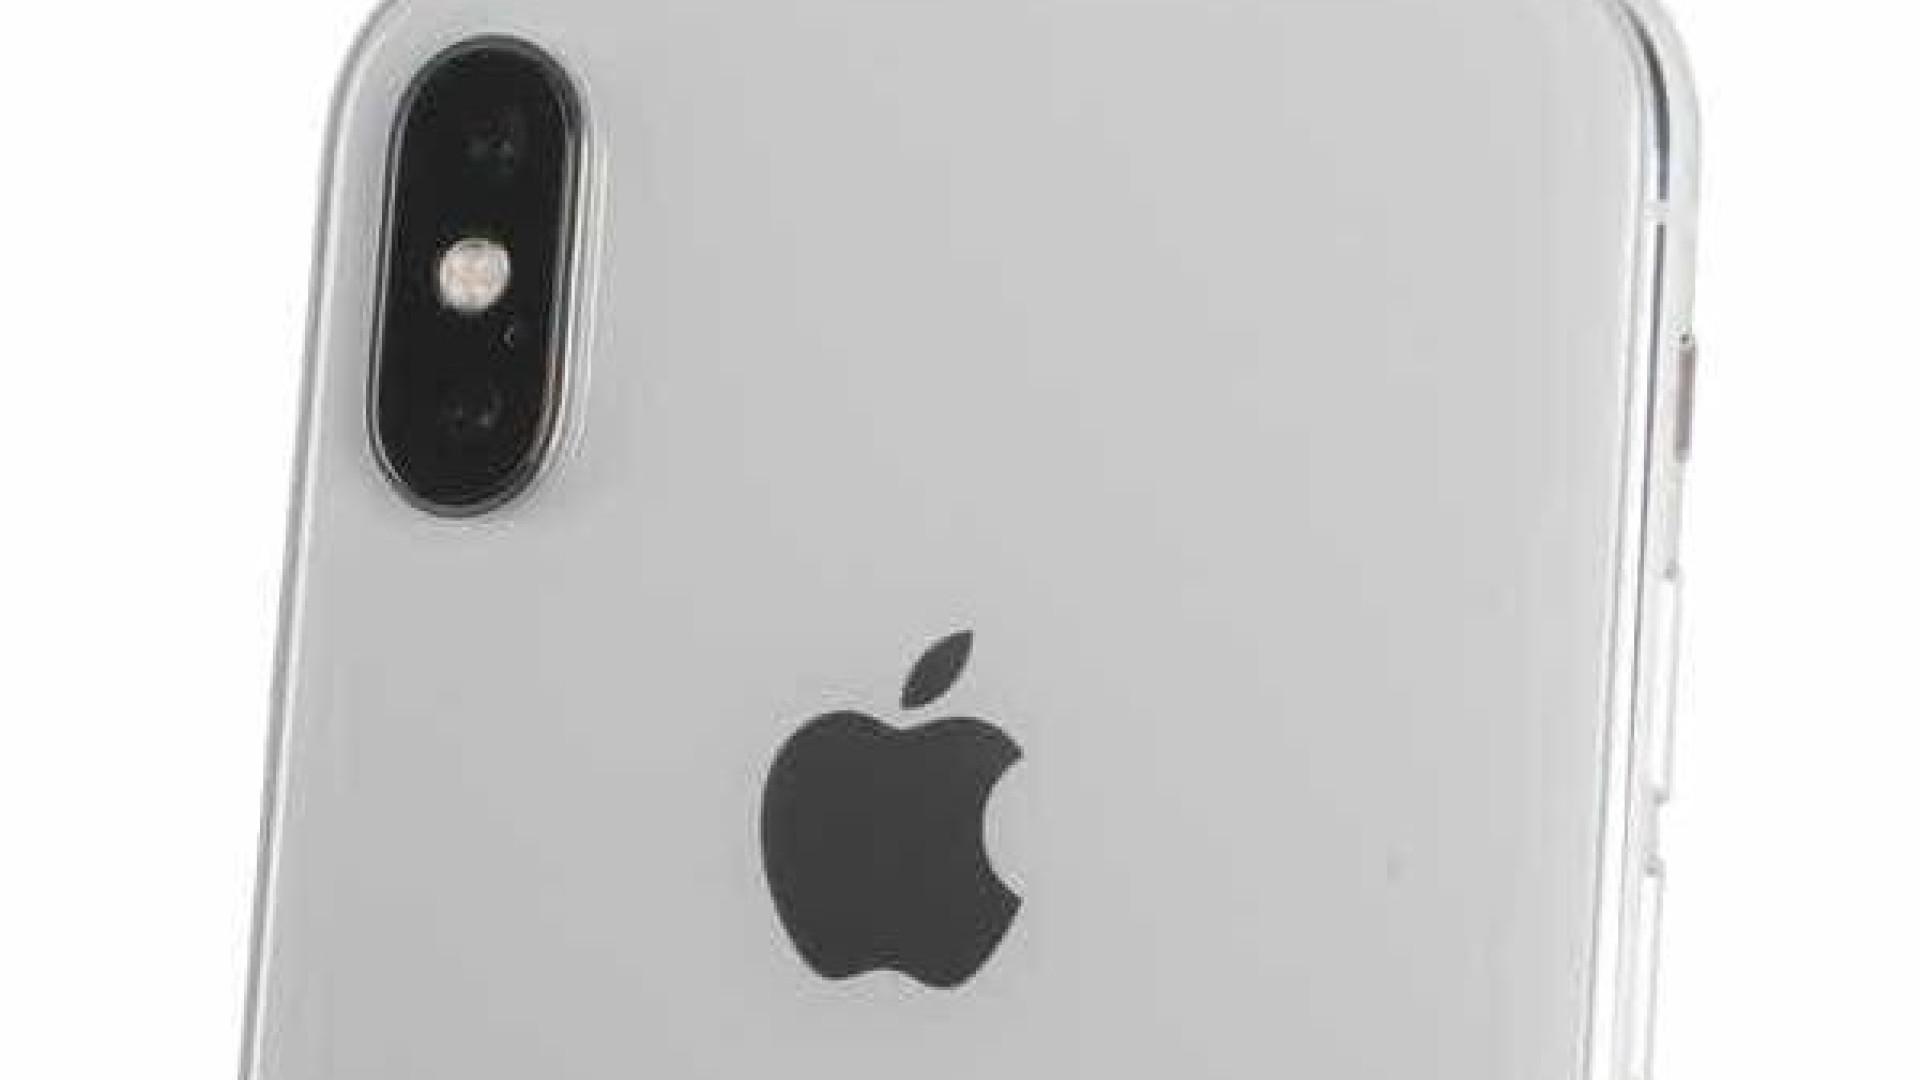 Utilizadores de iPhone X reclamam de lentes partidas